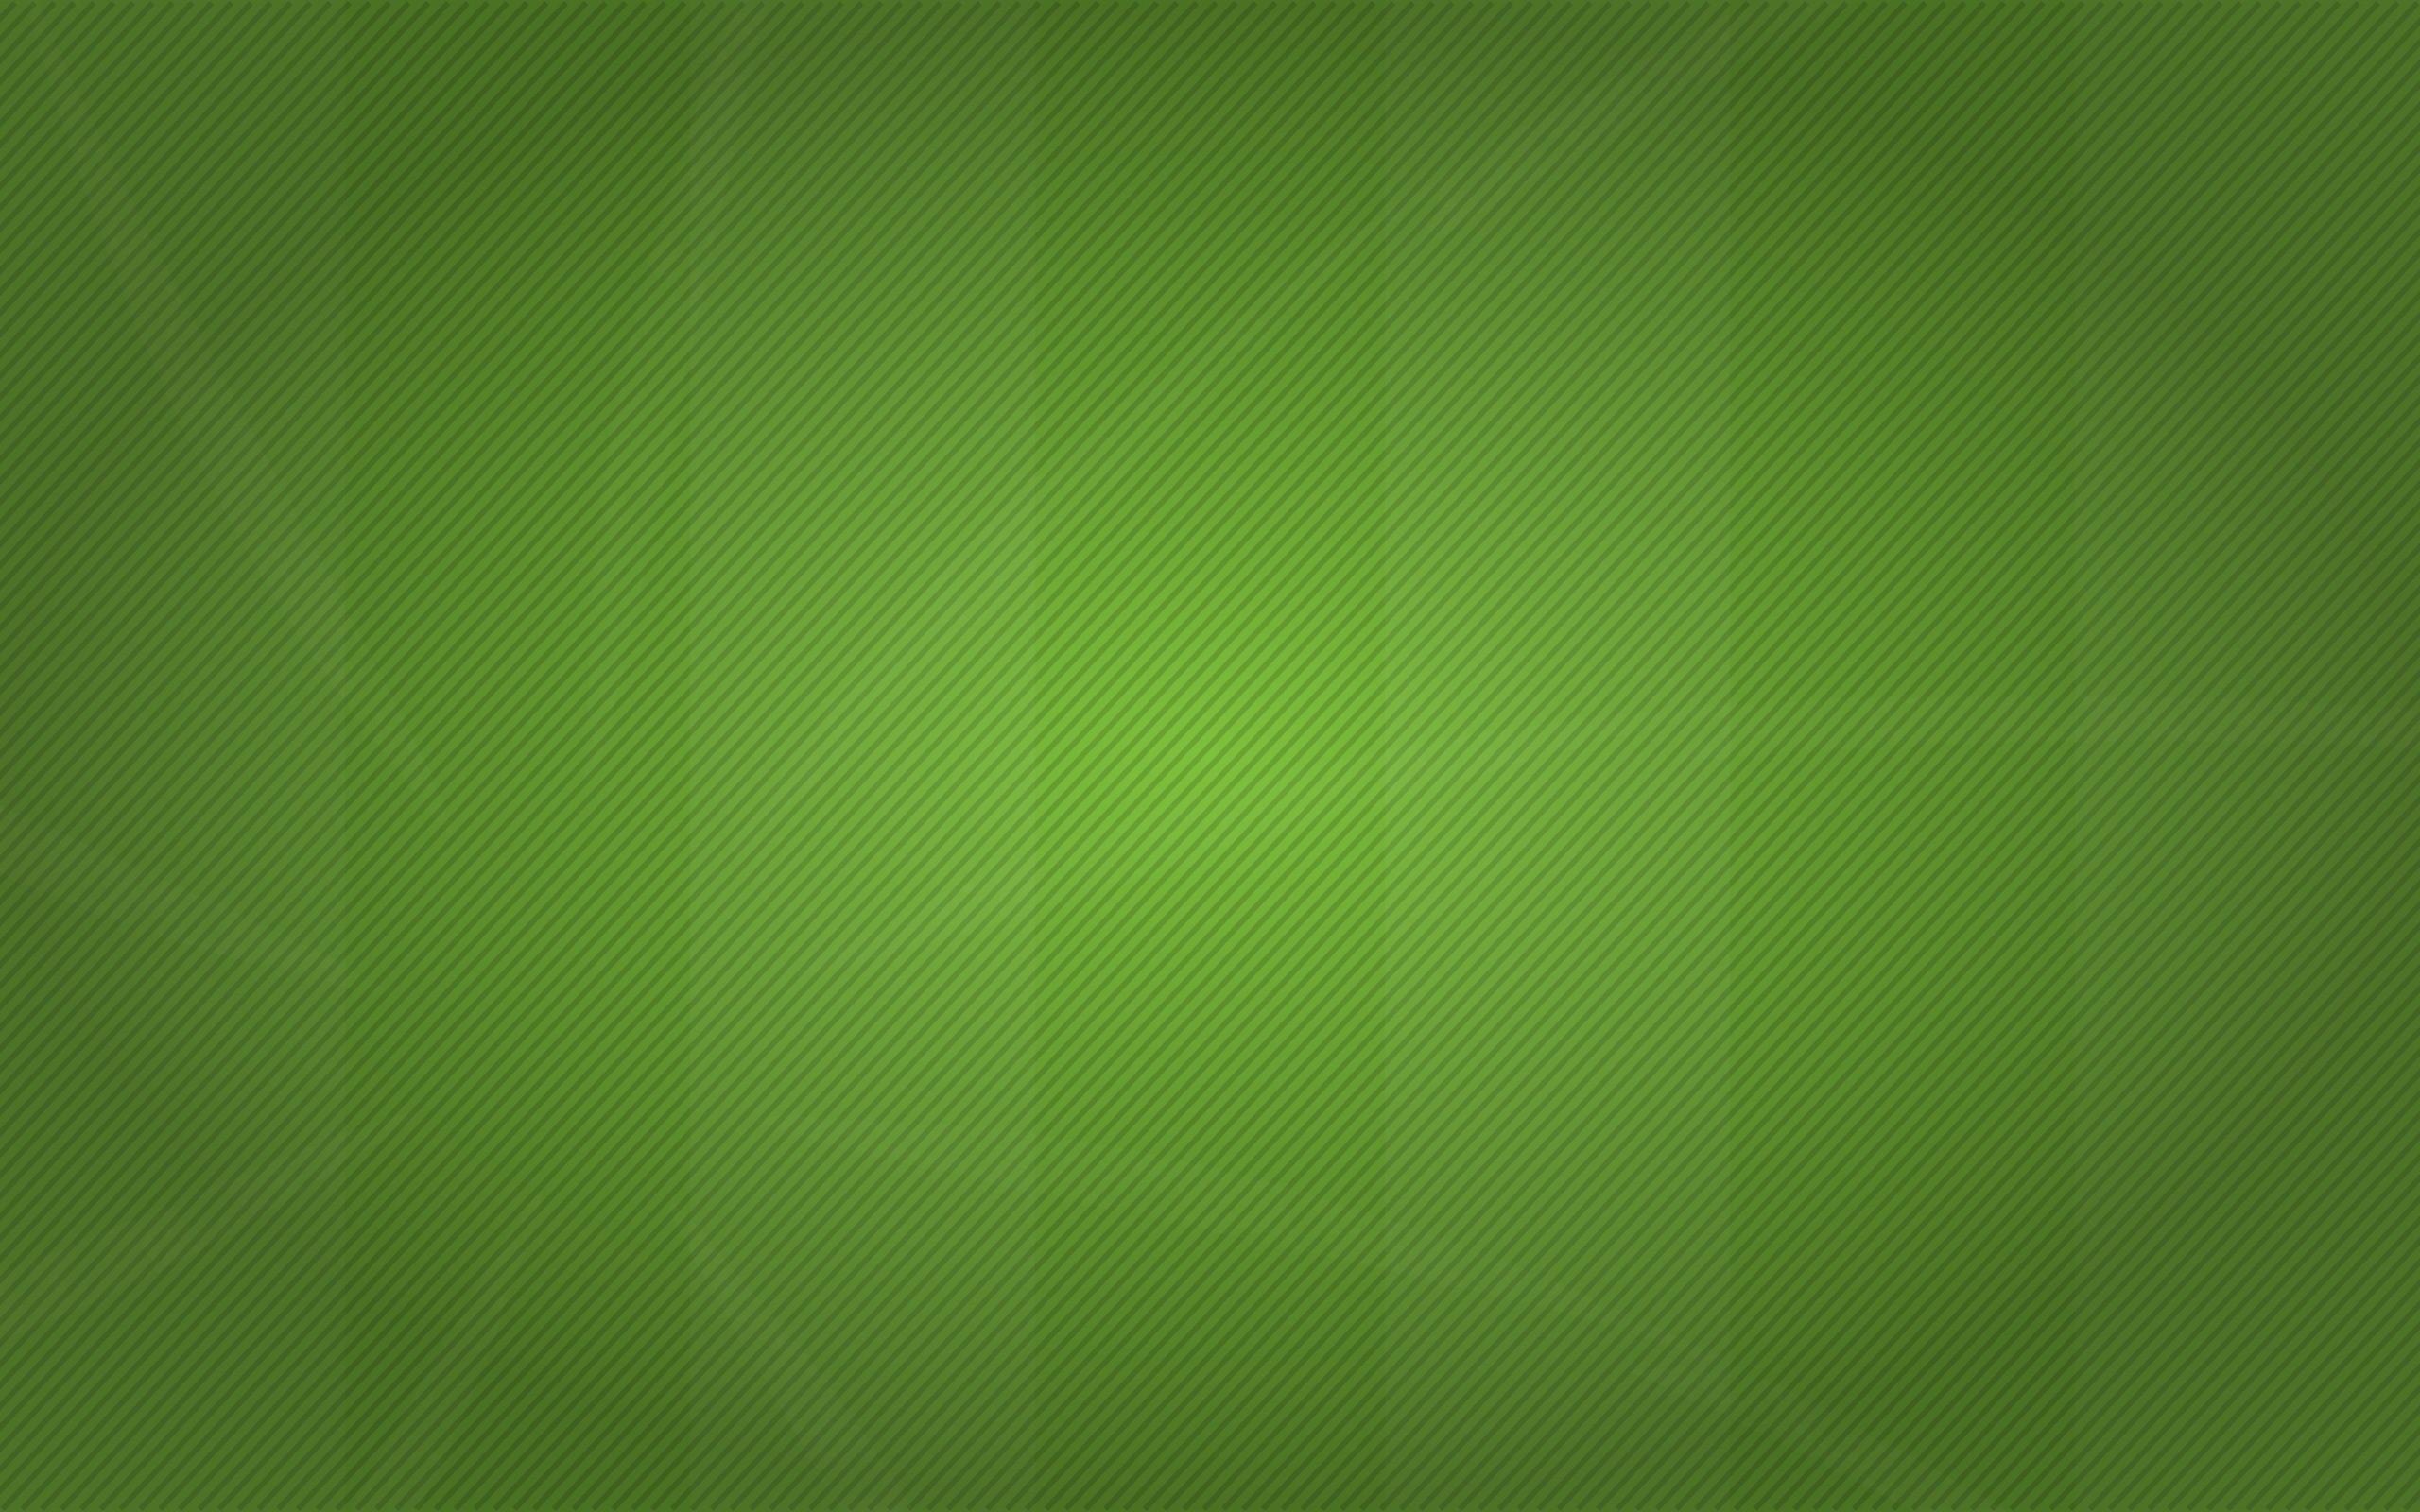 Preview Leaf Wallpaper | feelgrafix.com | Pinterest | Wallpaper and Leaves